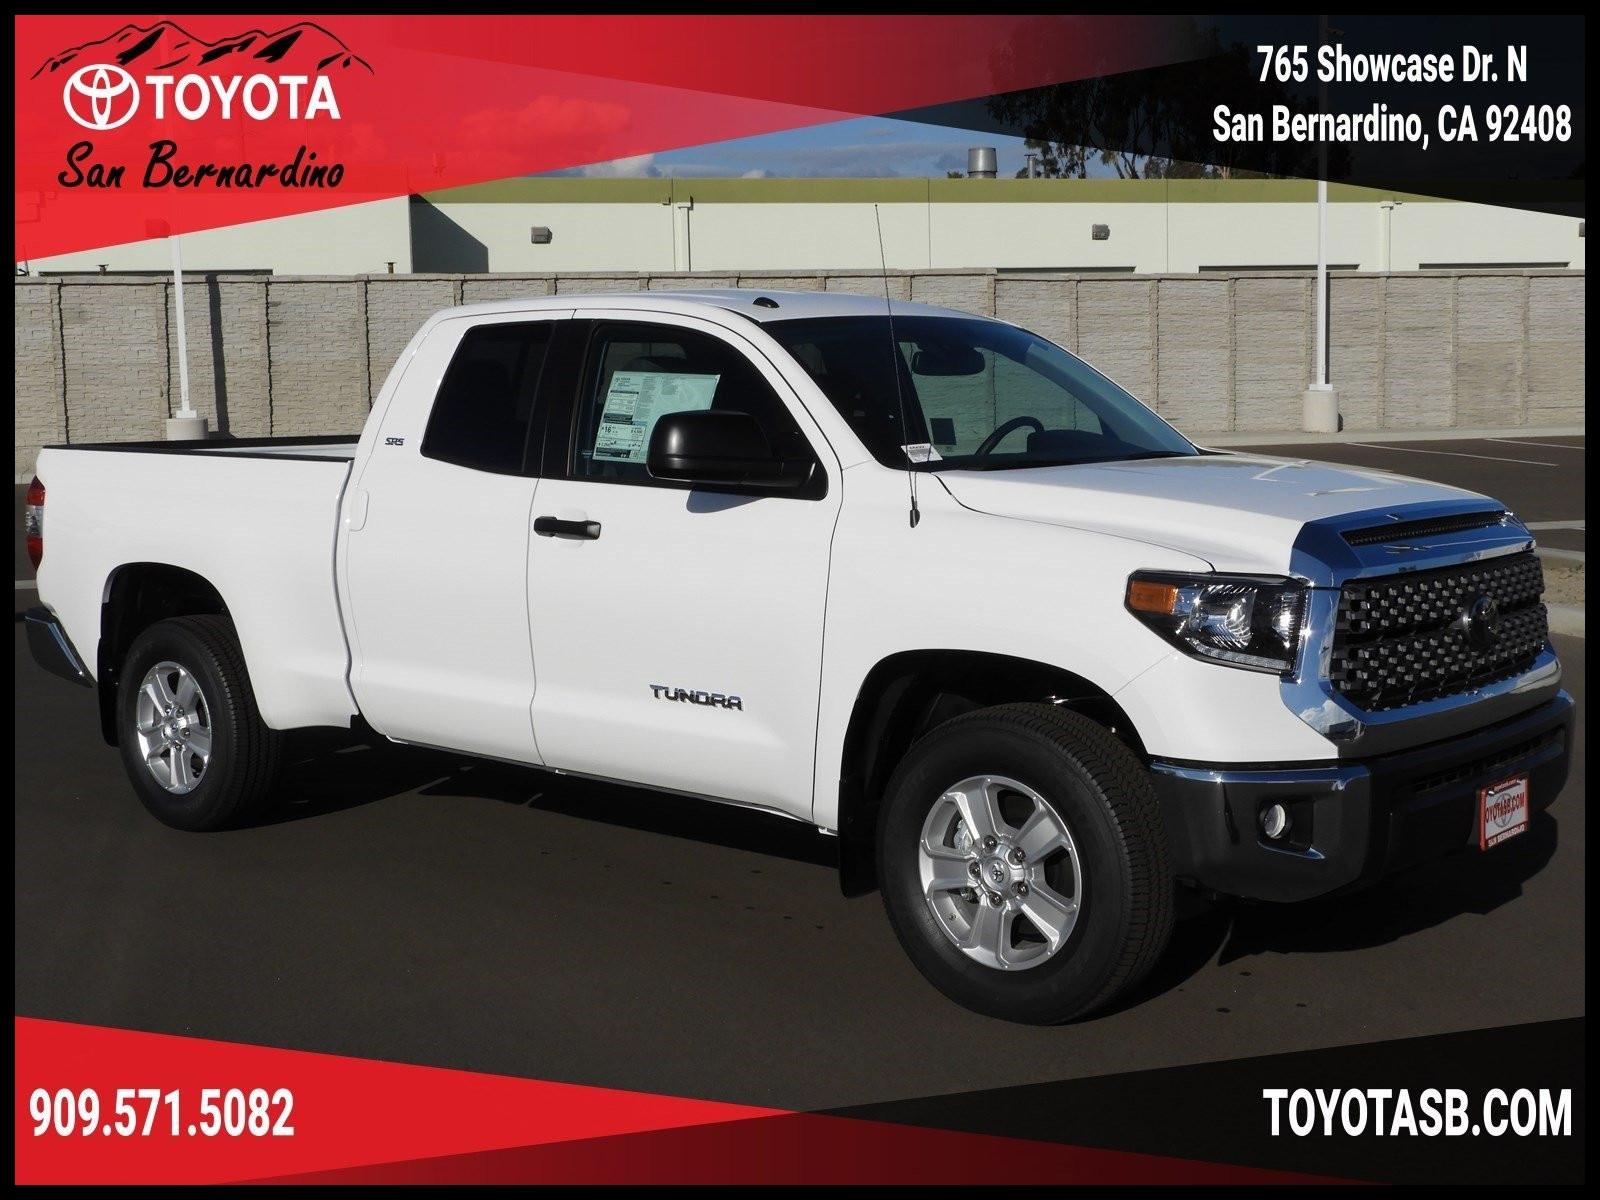 2018 toyota Tundra Diesel Lovely 2018 toyota Tundra for Sale In San Bernardino Ca toyota